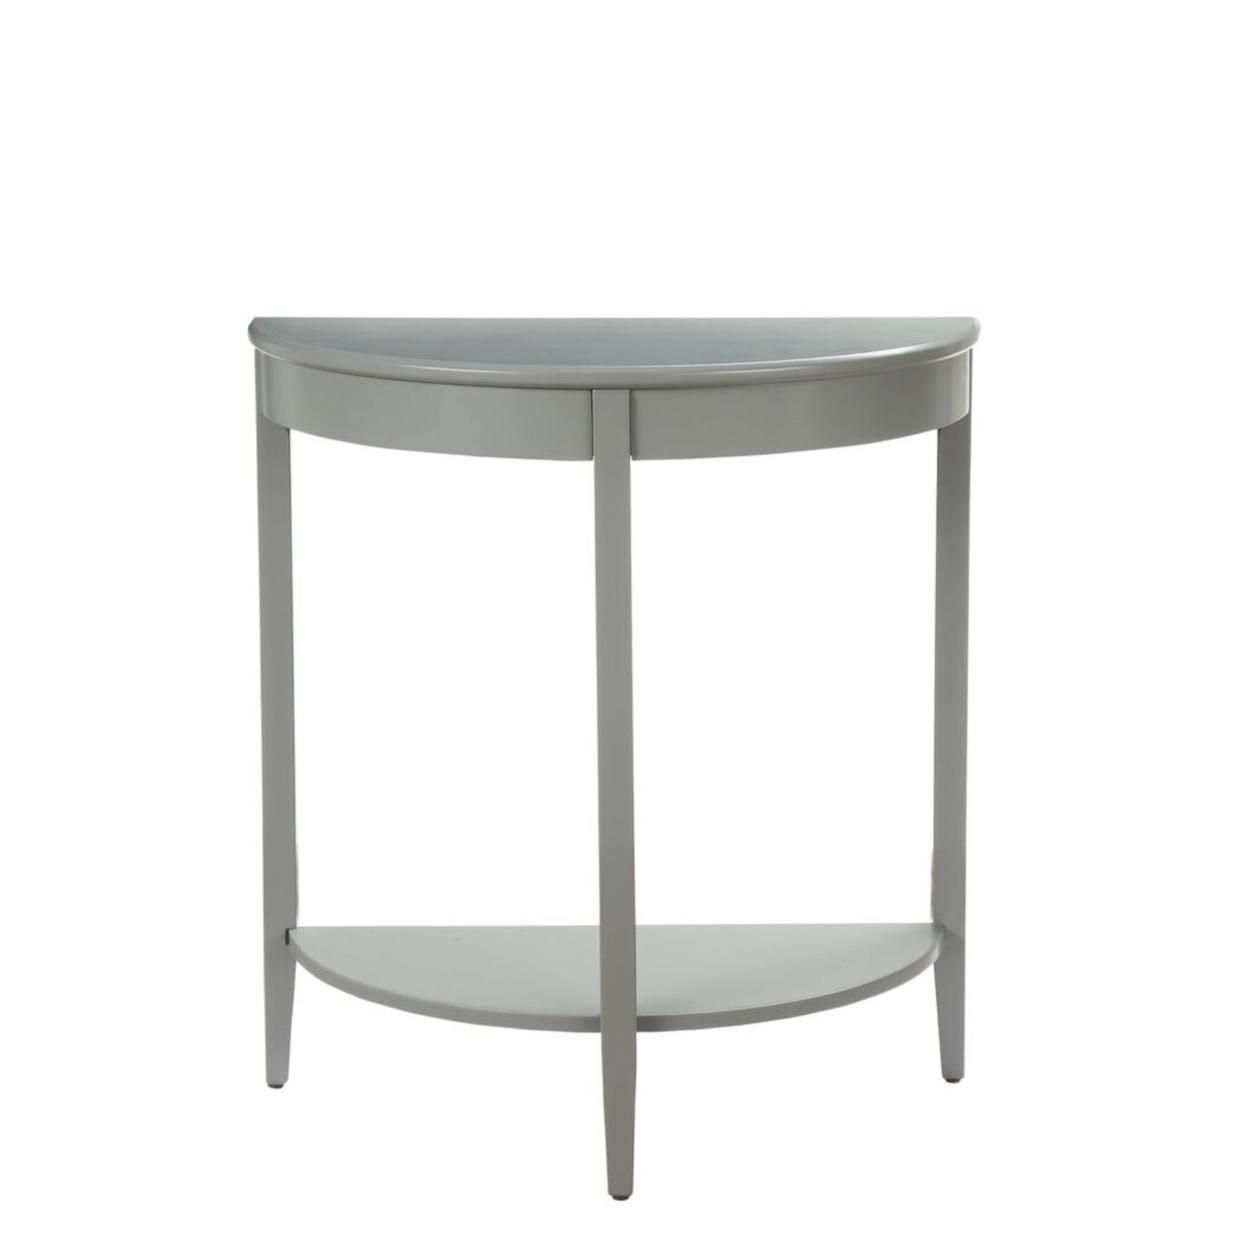 Saltoro Sherpi Wooden Half Moon Shaped Console Table with One Open Bottom Shelf, Gray